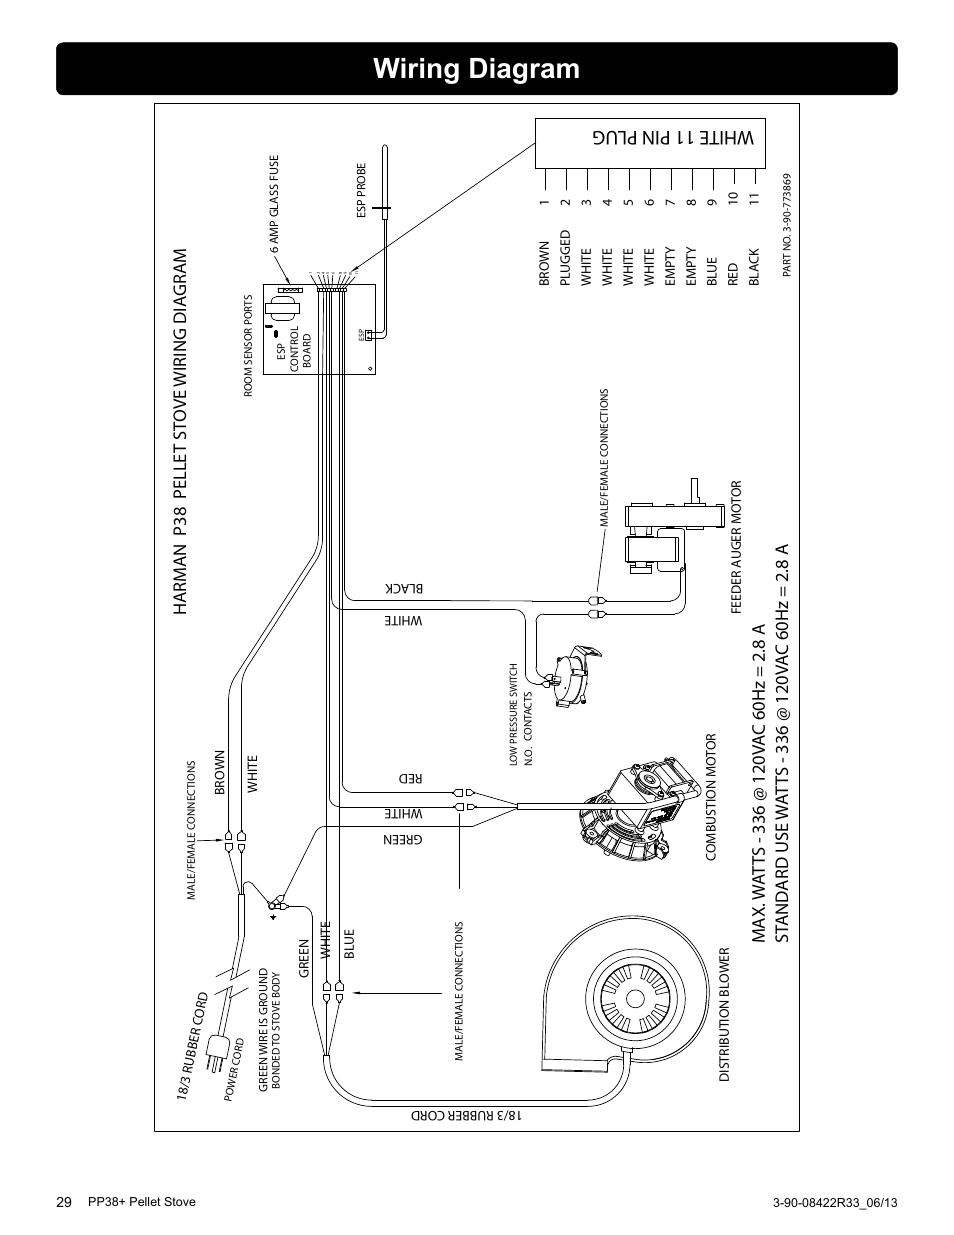 Wiring Diagram  White 11 Pin Plug  Harm An P38 Pelle T St